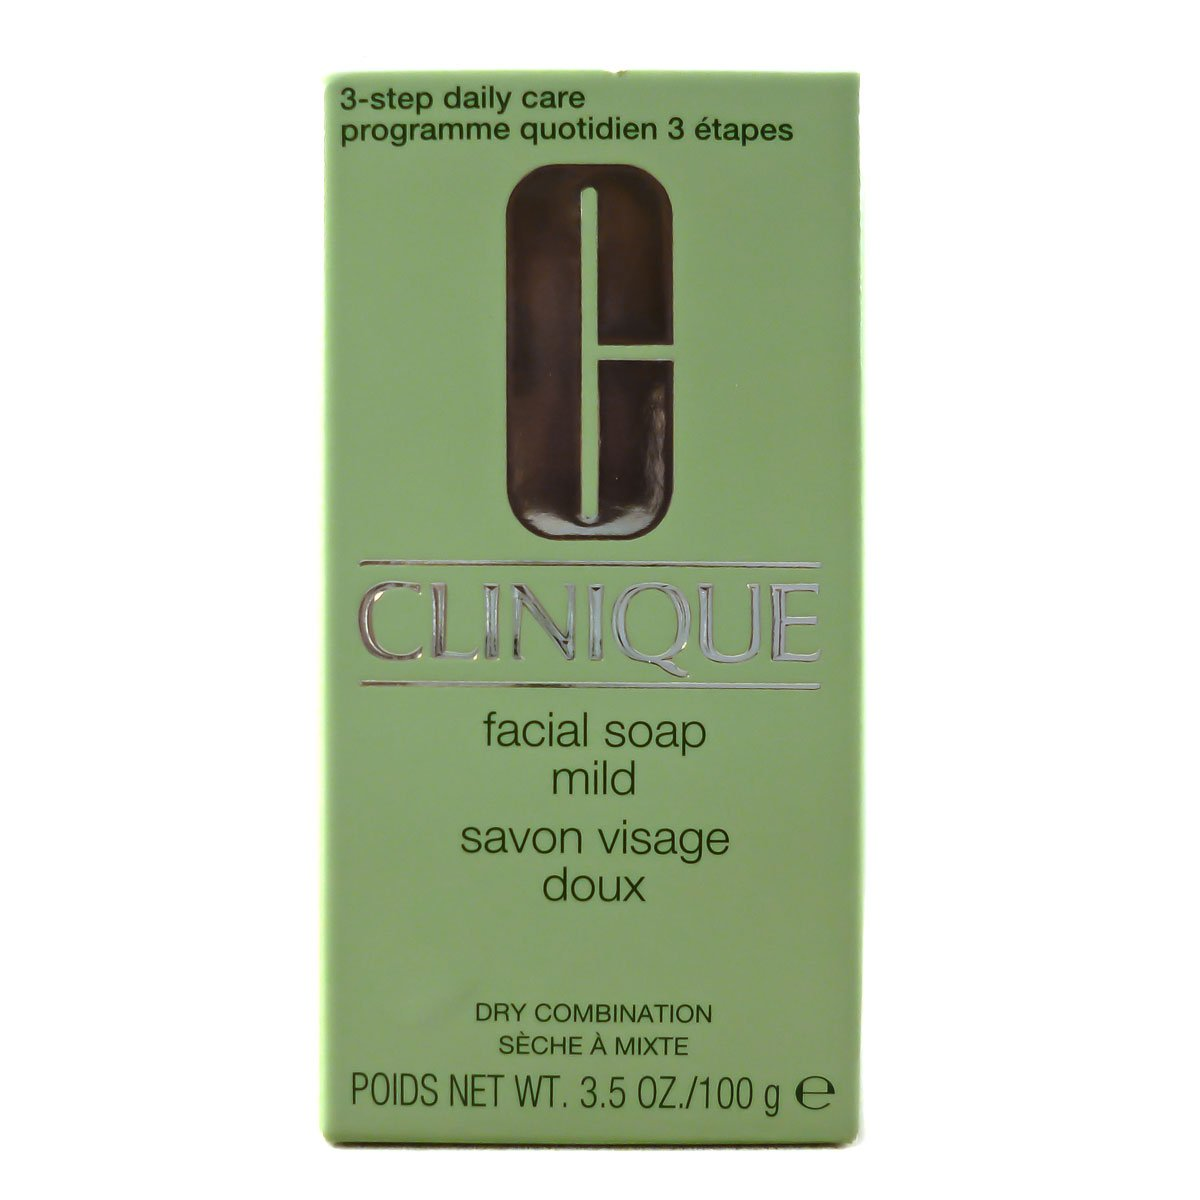 Clinique Facial Mild Soap 0020714008611 CLI00419